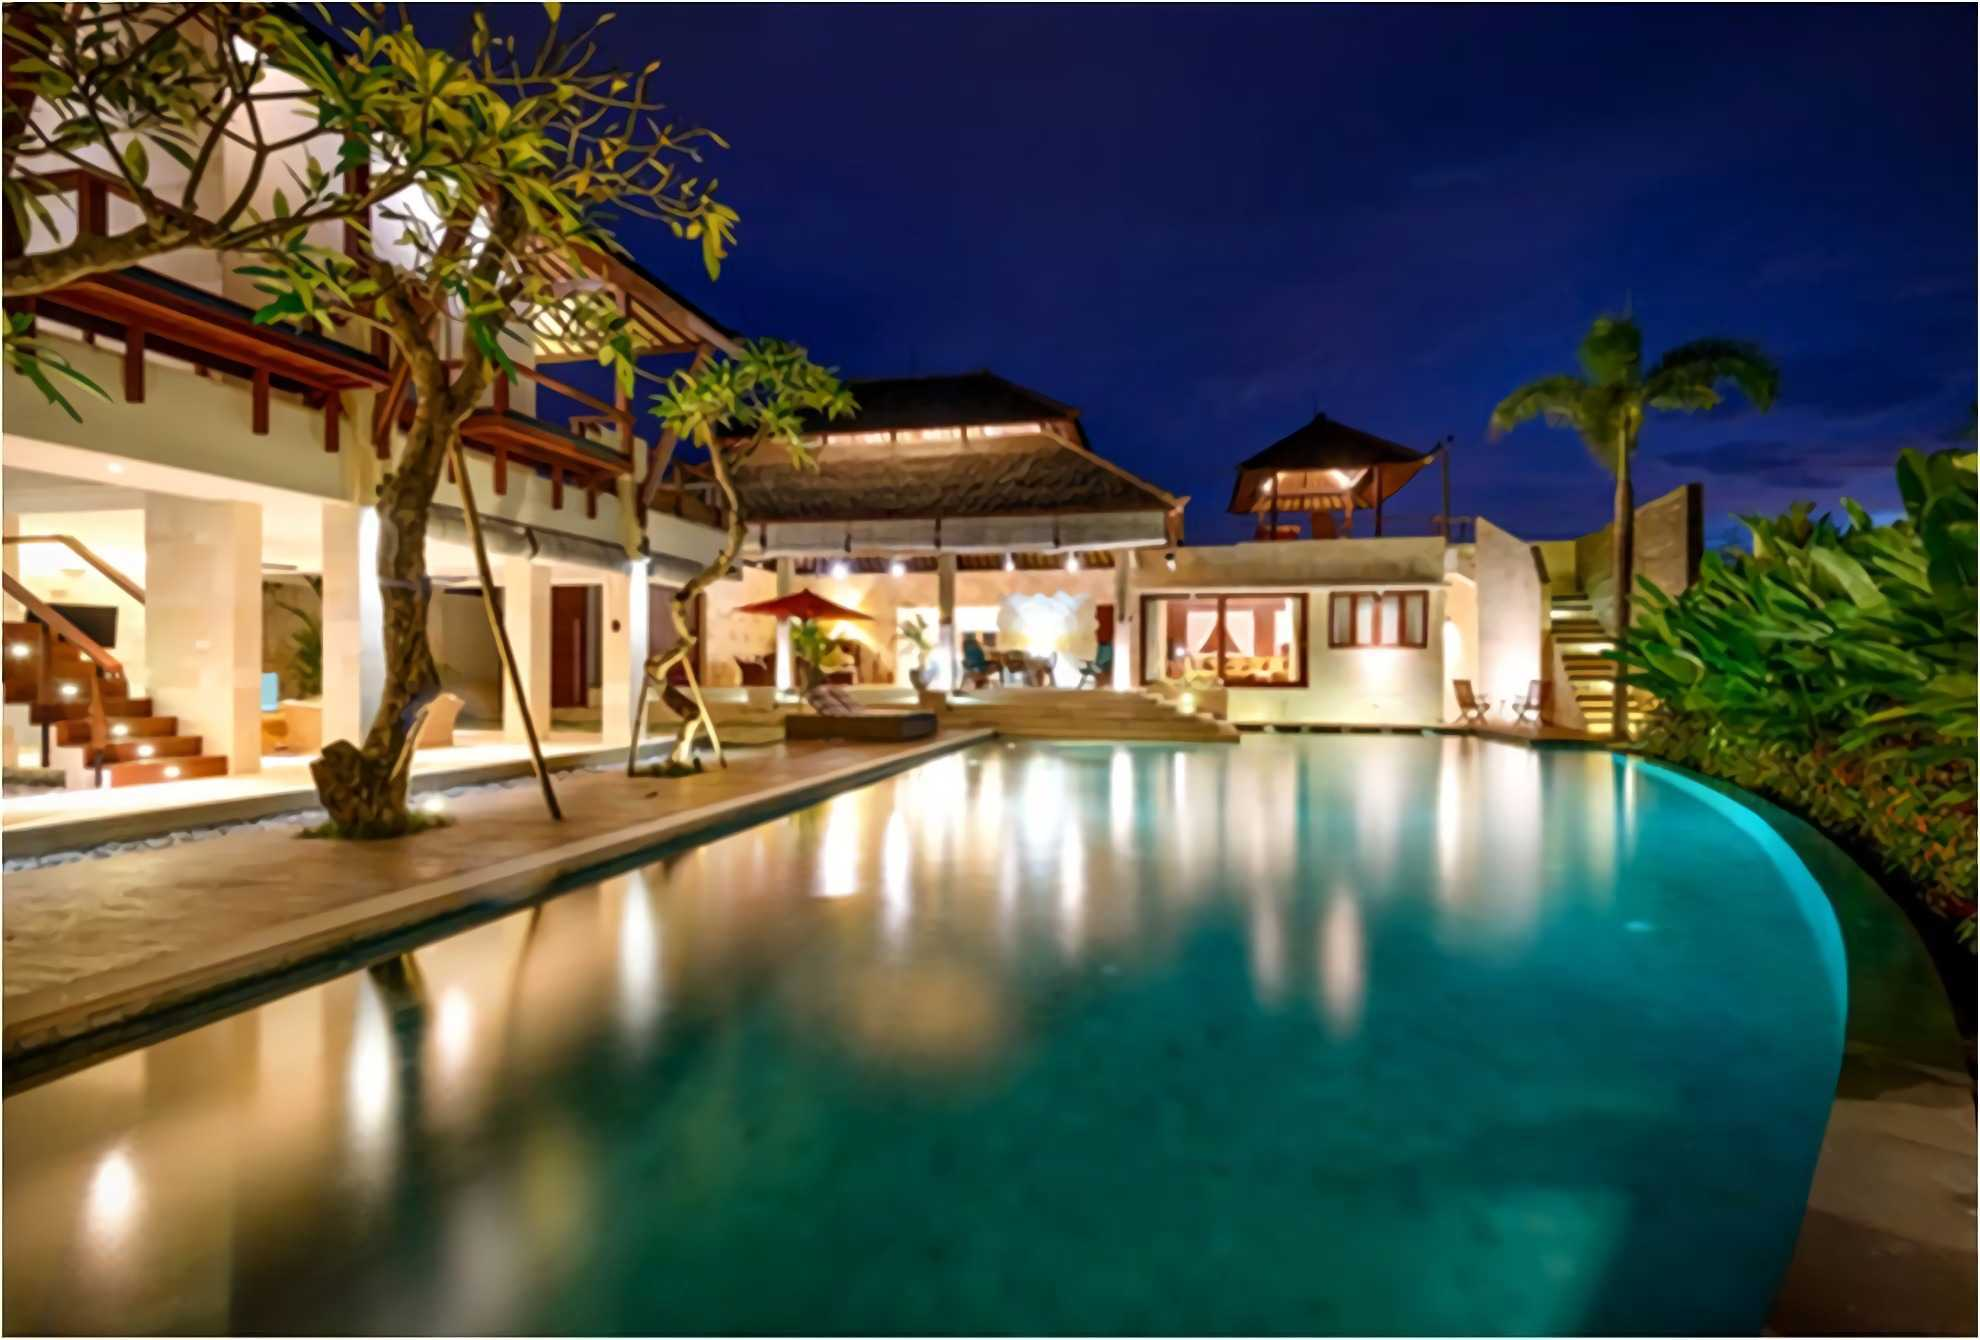 Hg Architects & Designers Associates Villa Saya Canggu, Bali Canggu, Bali Swimming Pool View   24262